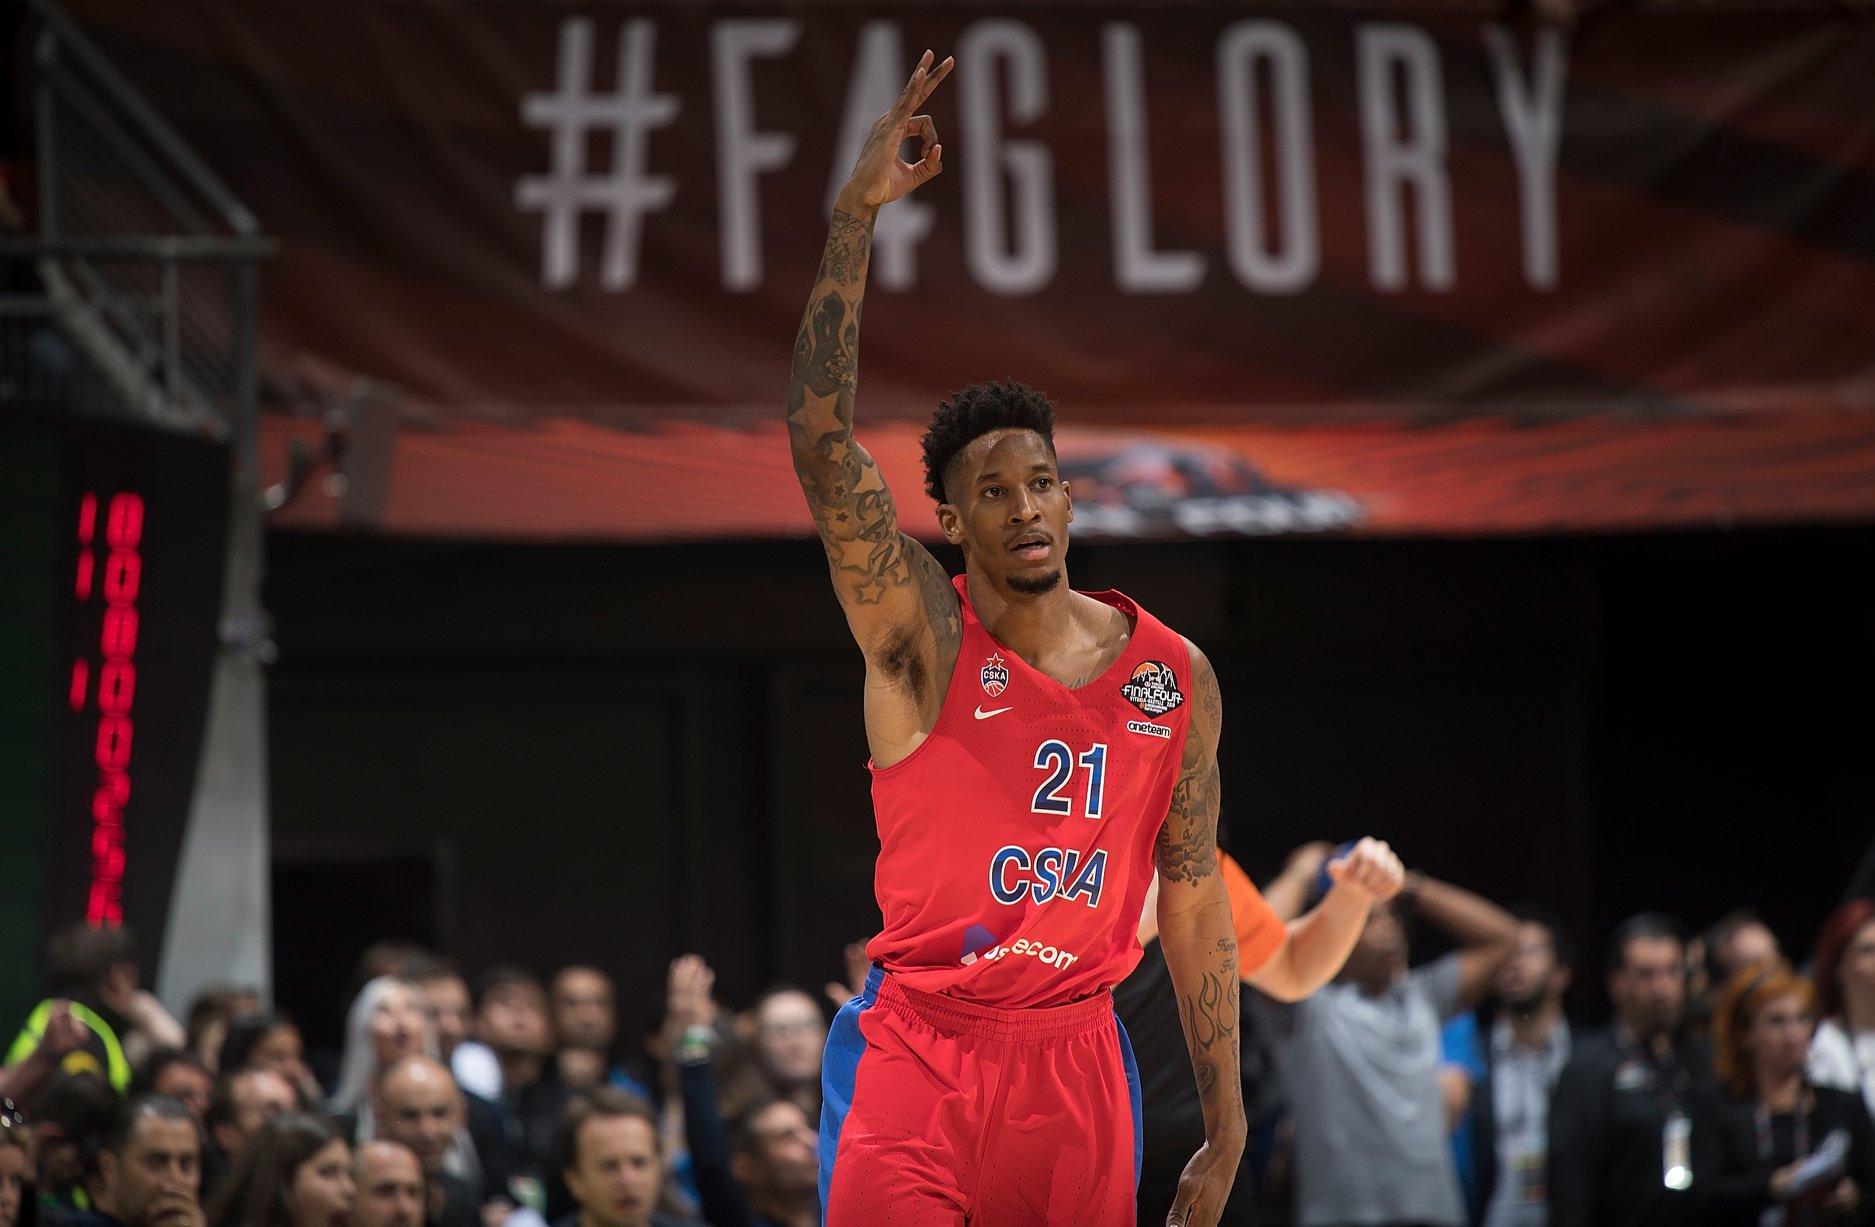 Will Clyburn kåret til EuroLeague Final Four MVP